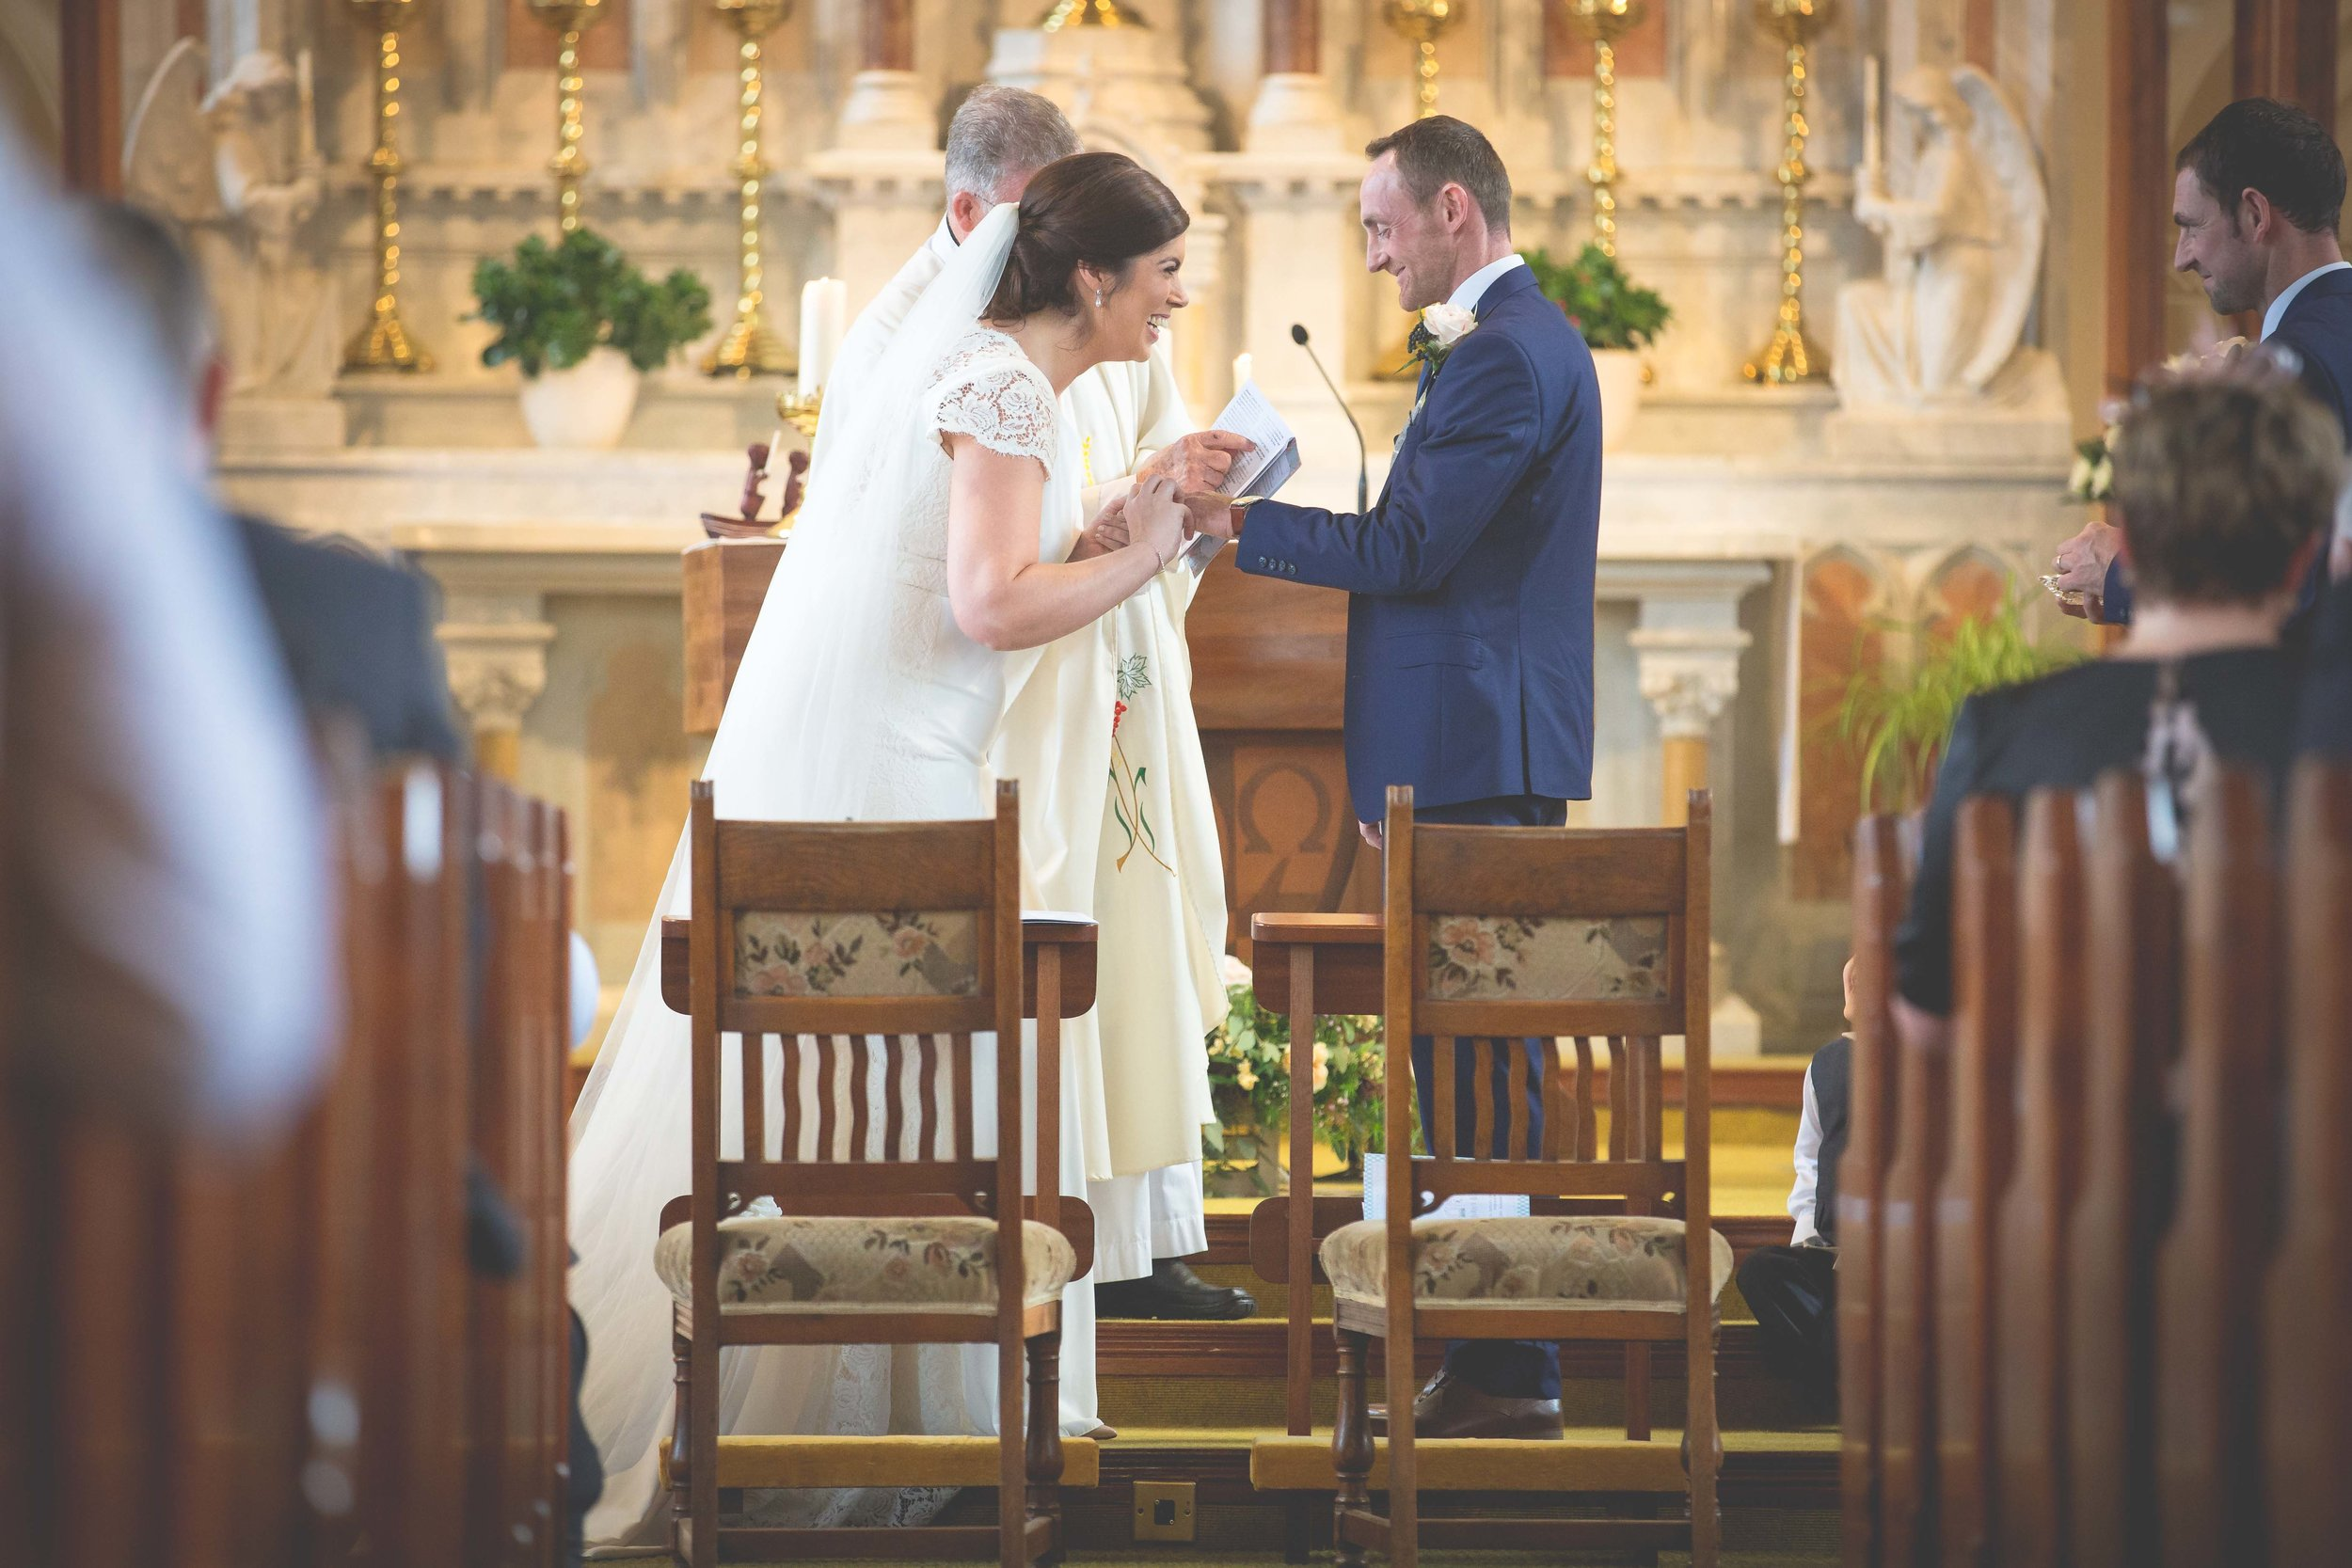 Northern Ireland Wedding Photographer   Brian McEwan Photography   Affordable Wedding Photography Throughout Antrim Down Armagh Tyrone Londonderry Derry Down Fermanagh -64.jpg